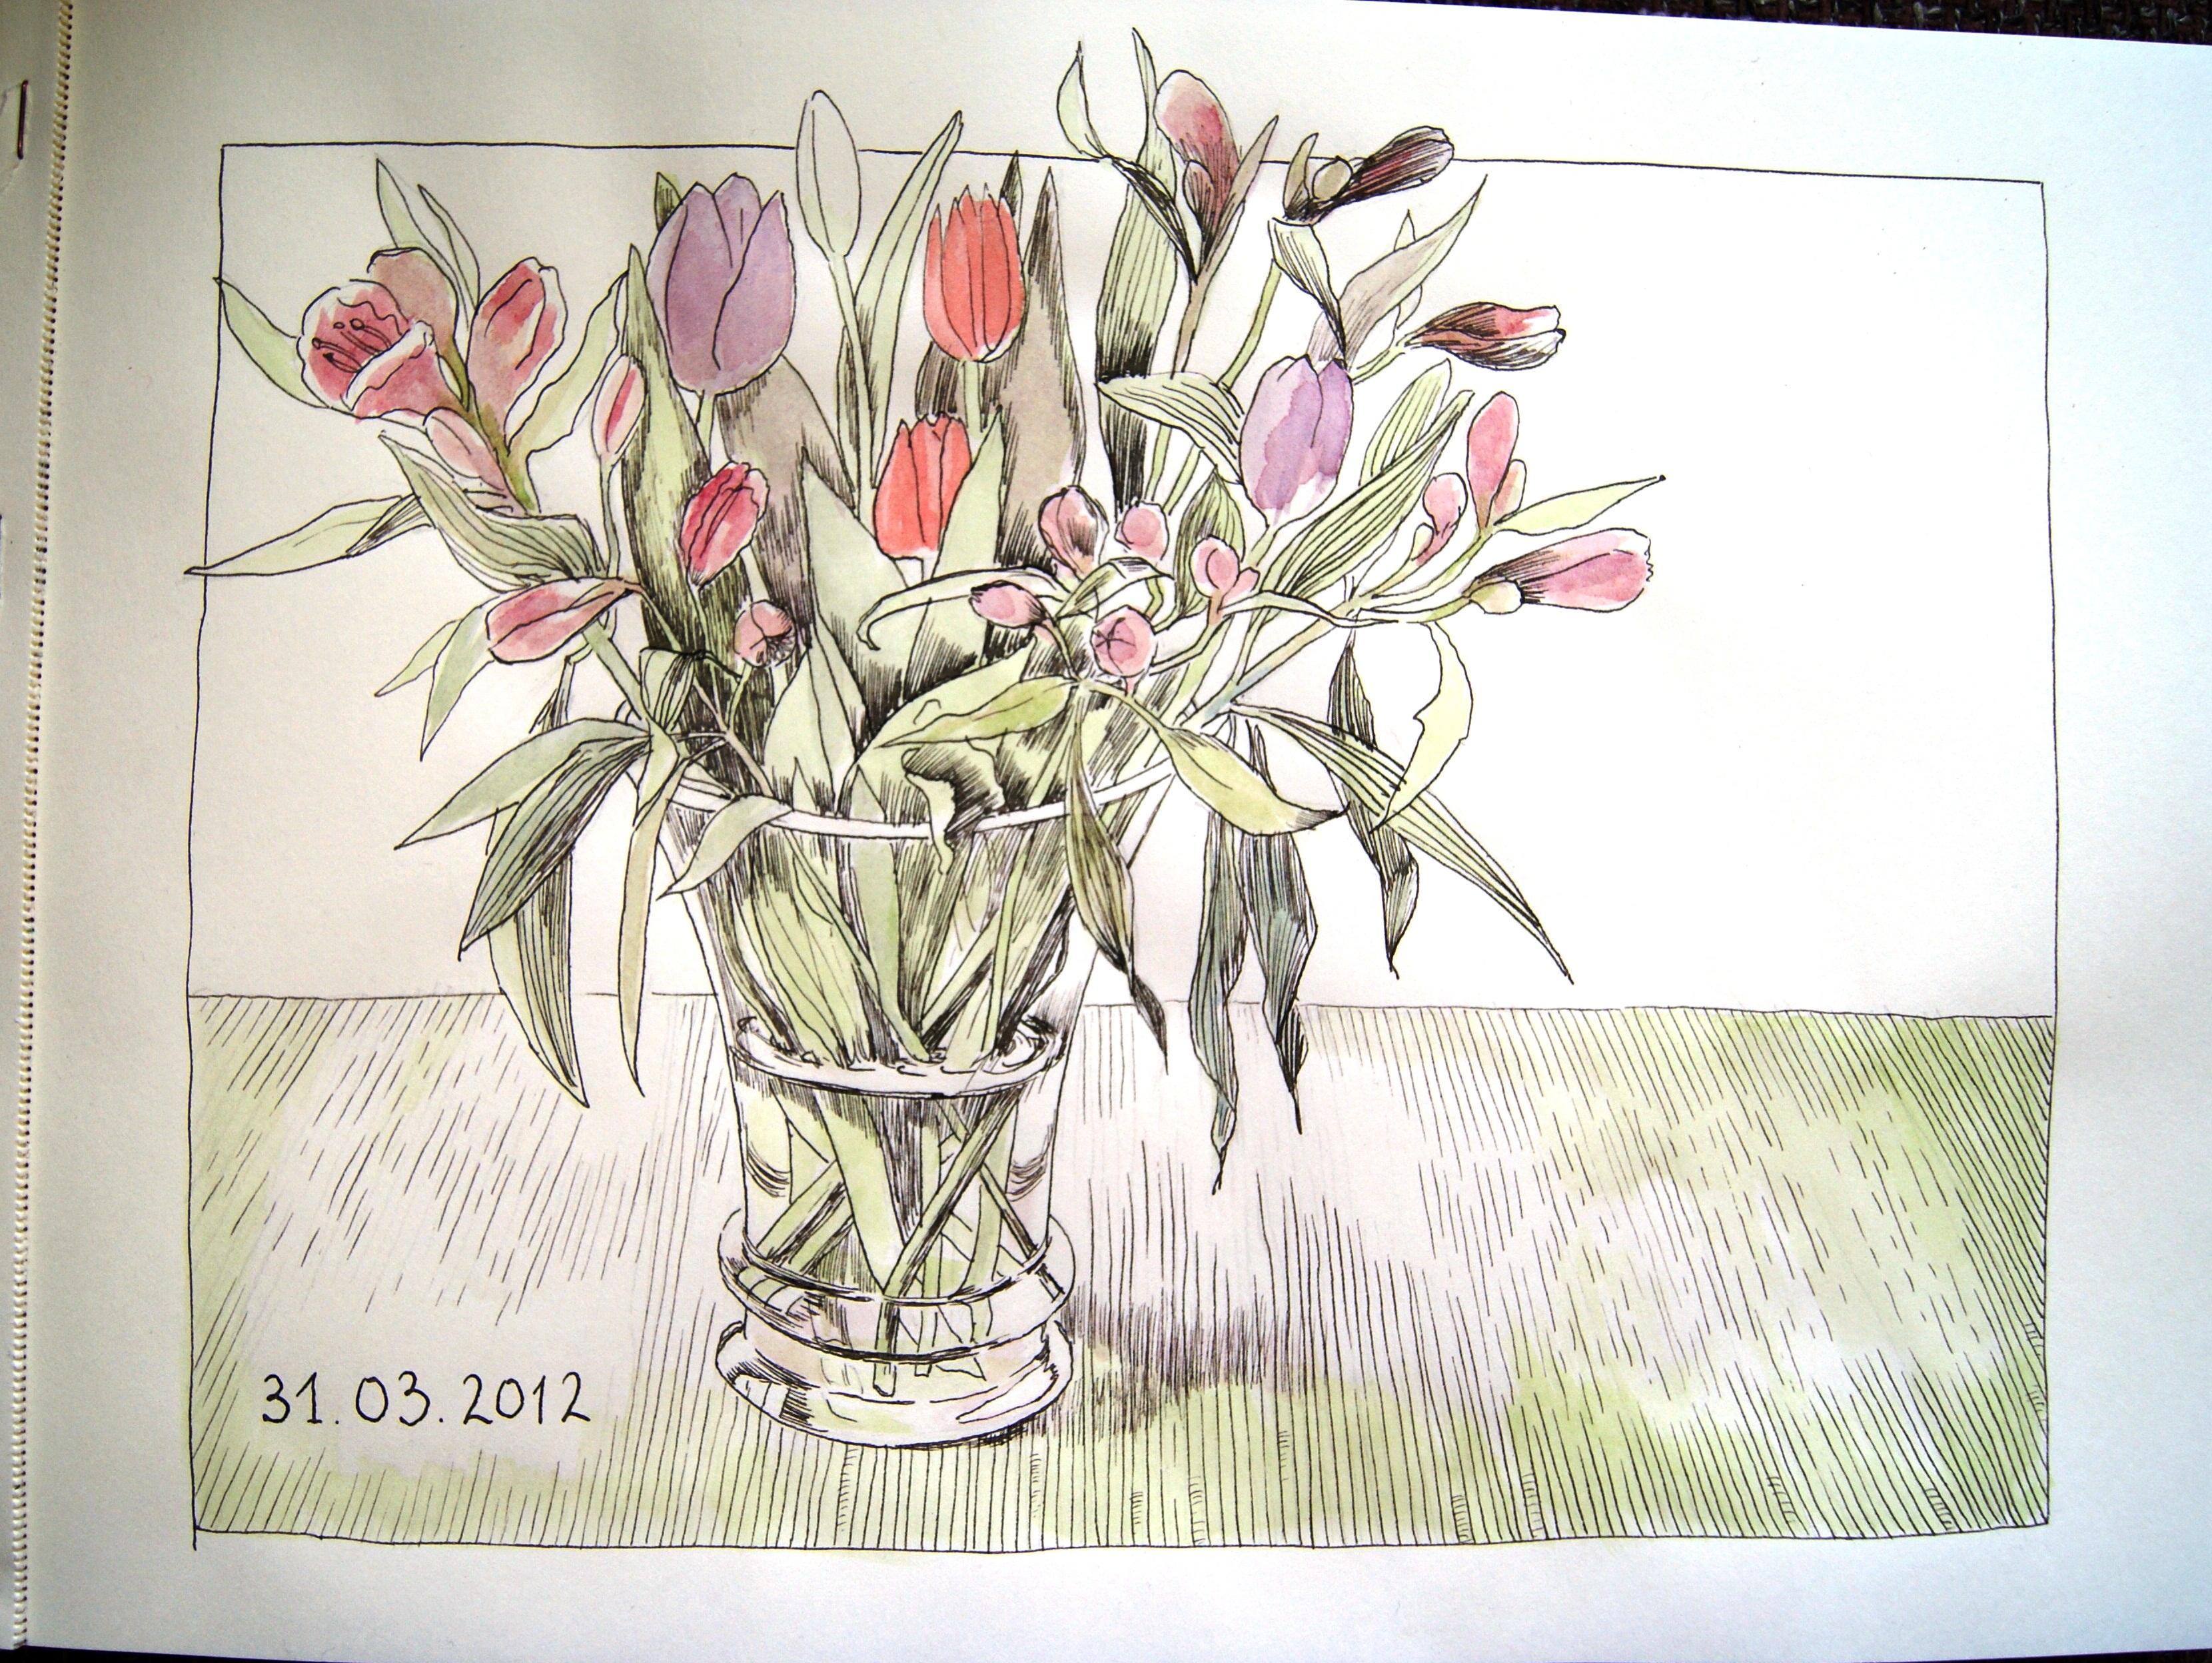 рисунки тушью и карандашом: